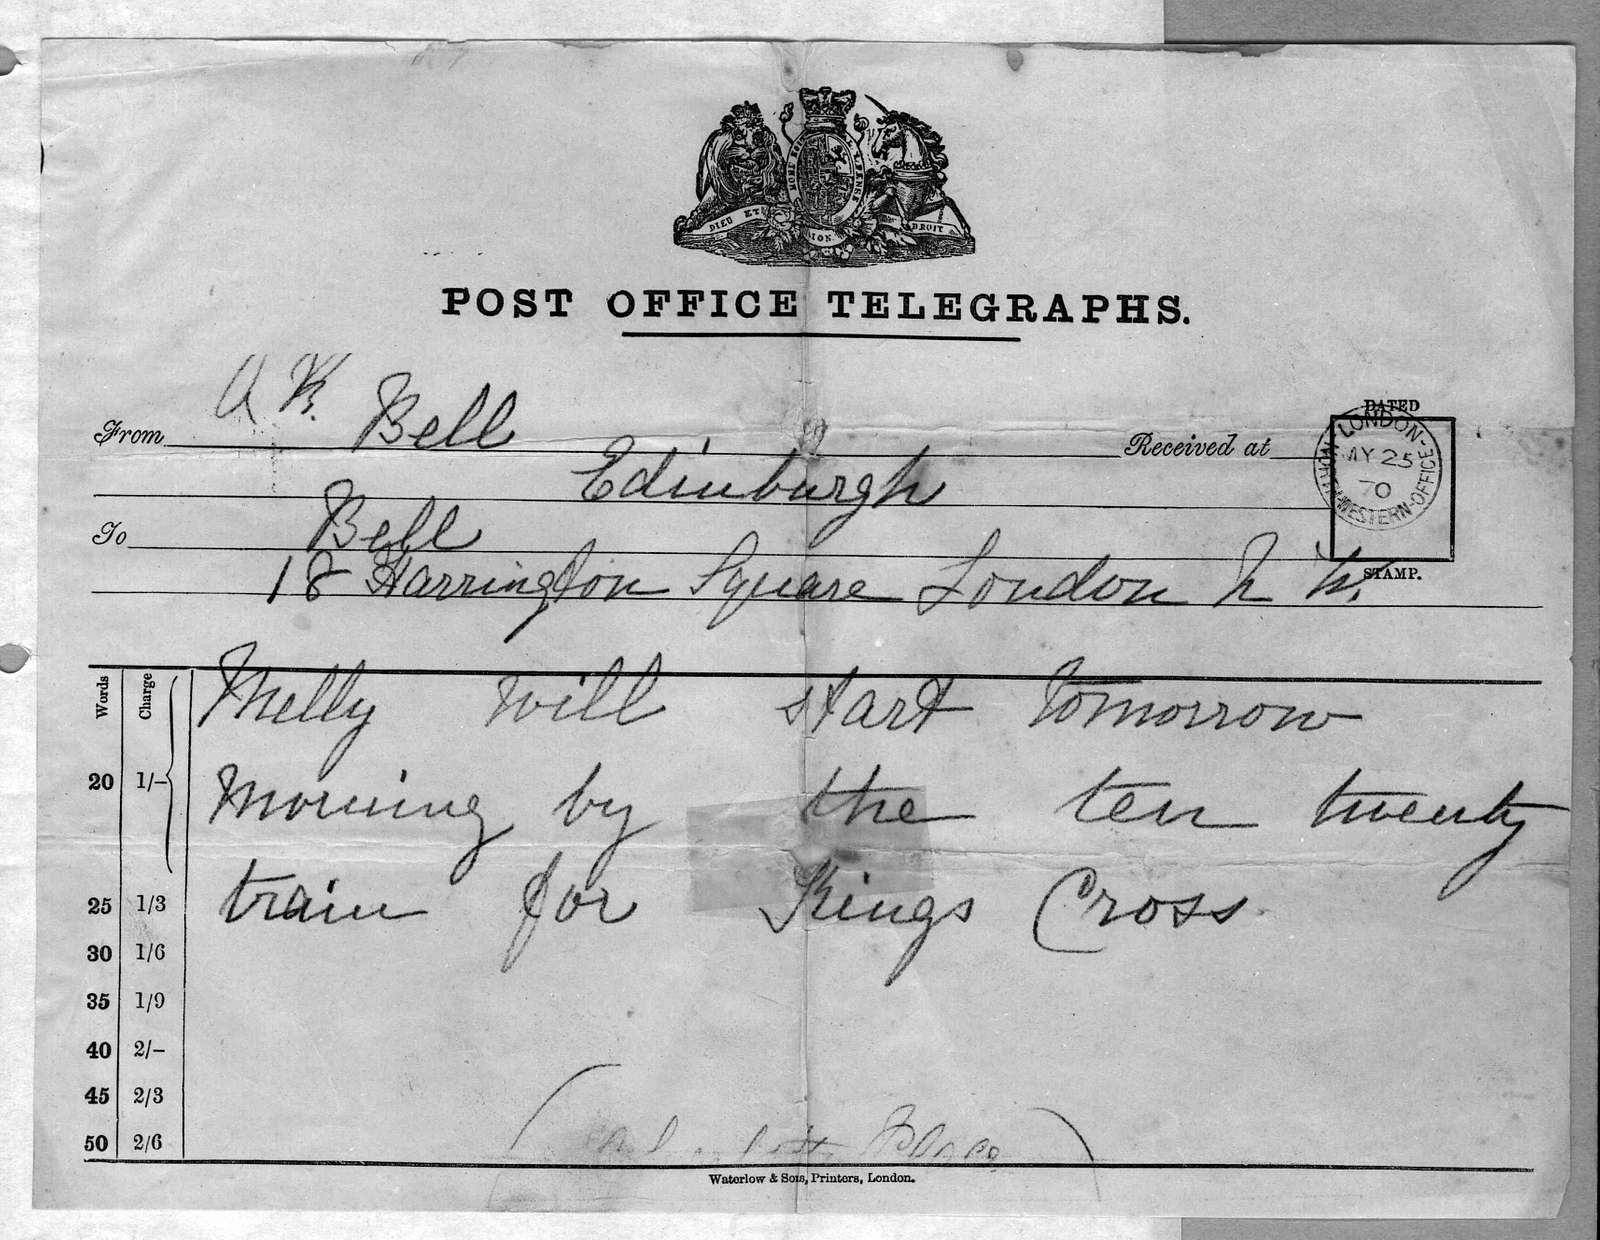 Telegram from Alexander Graham Bell to Alexander Melville Bell, May 25, 1870